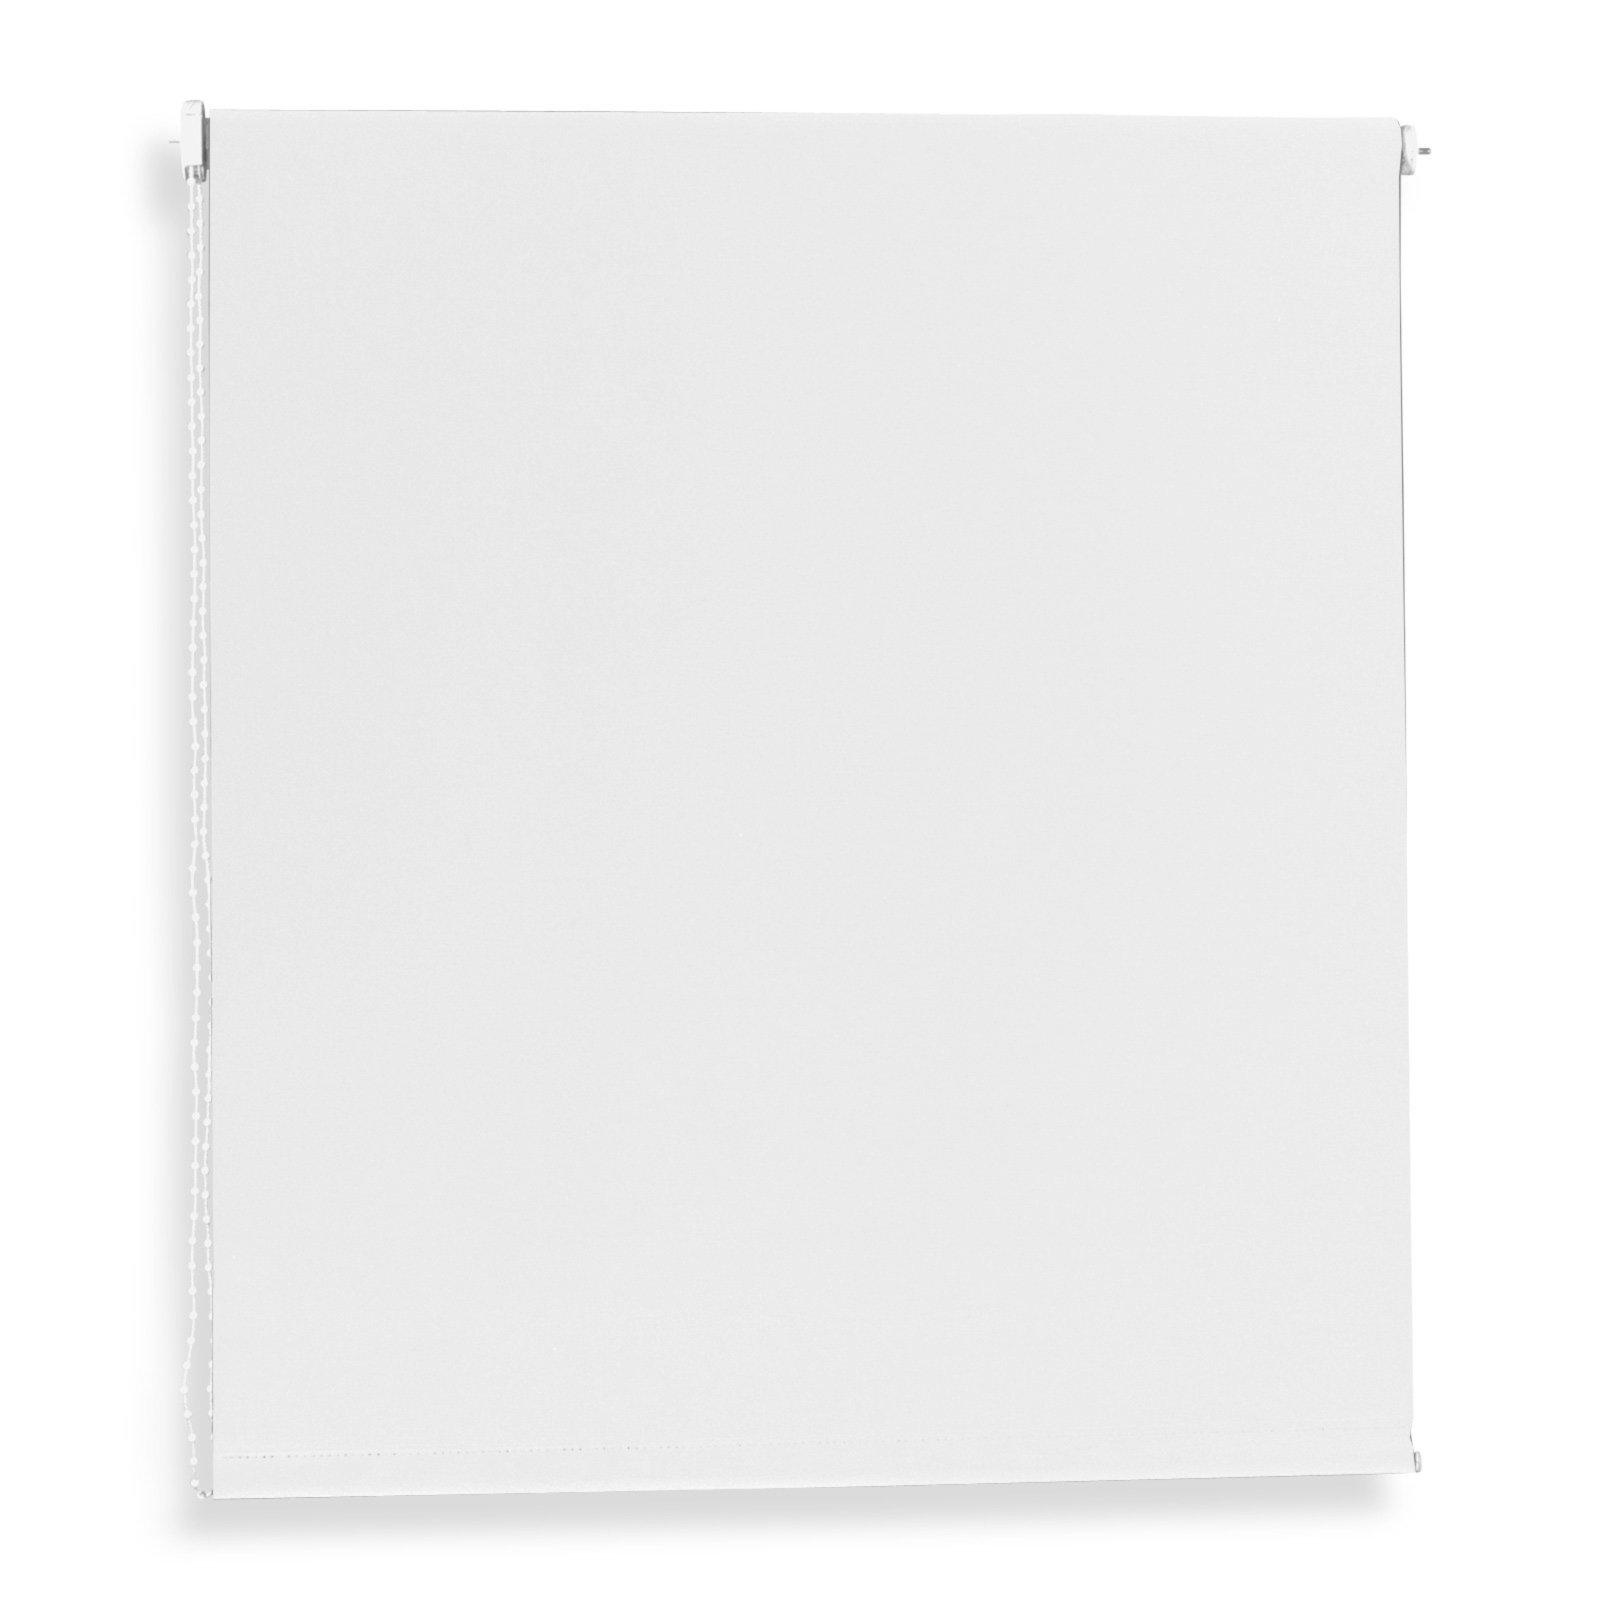 Rollo - weiß - 220x180 cm